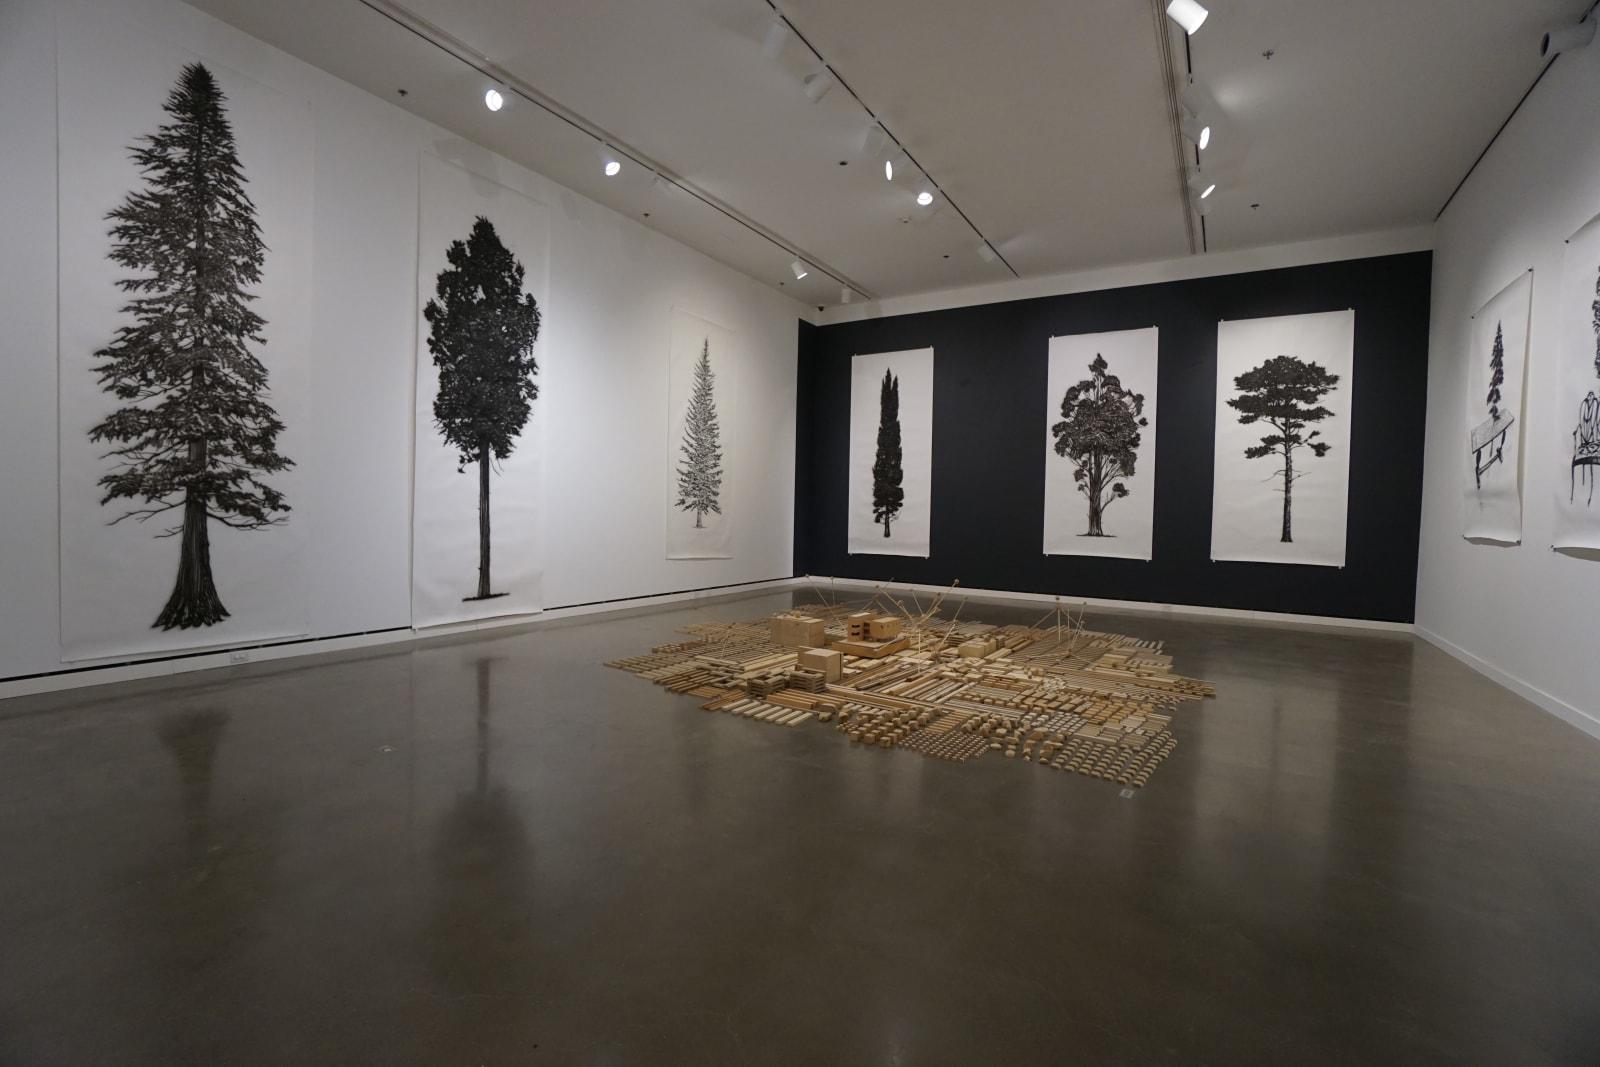 Intimate Expansive, Rochester Art Center, Minnesota, Jan 18, 2018 - May 27, 2018